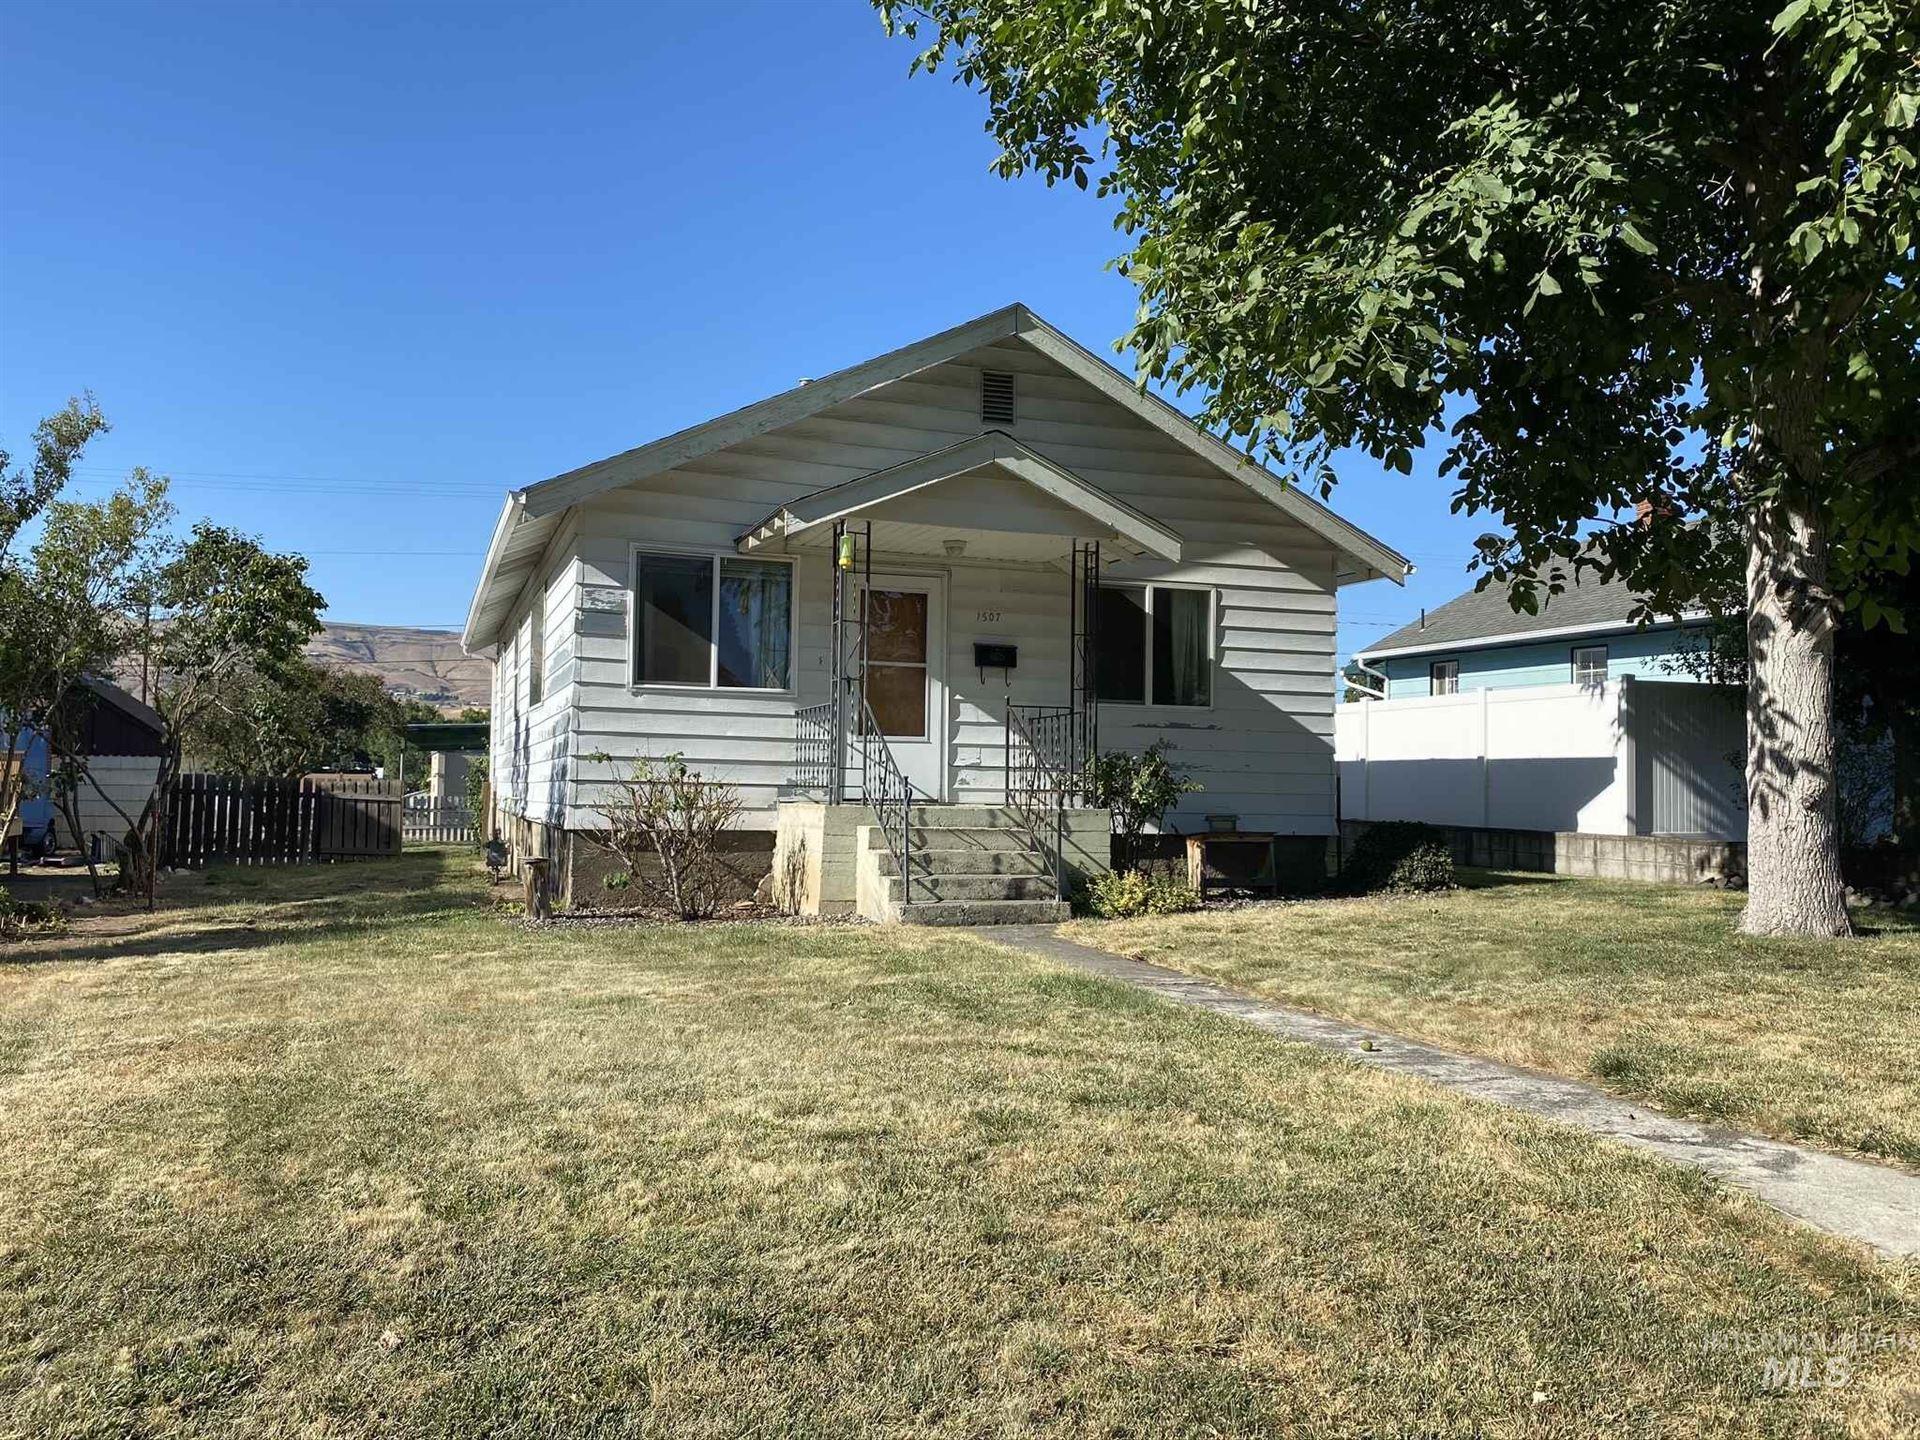 Photo of 1507 13th Avenue, Lewiston, ID 83501 (MLS # 98776667)